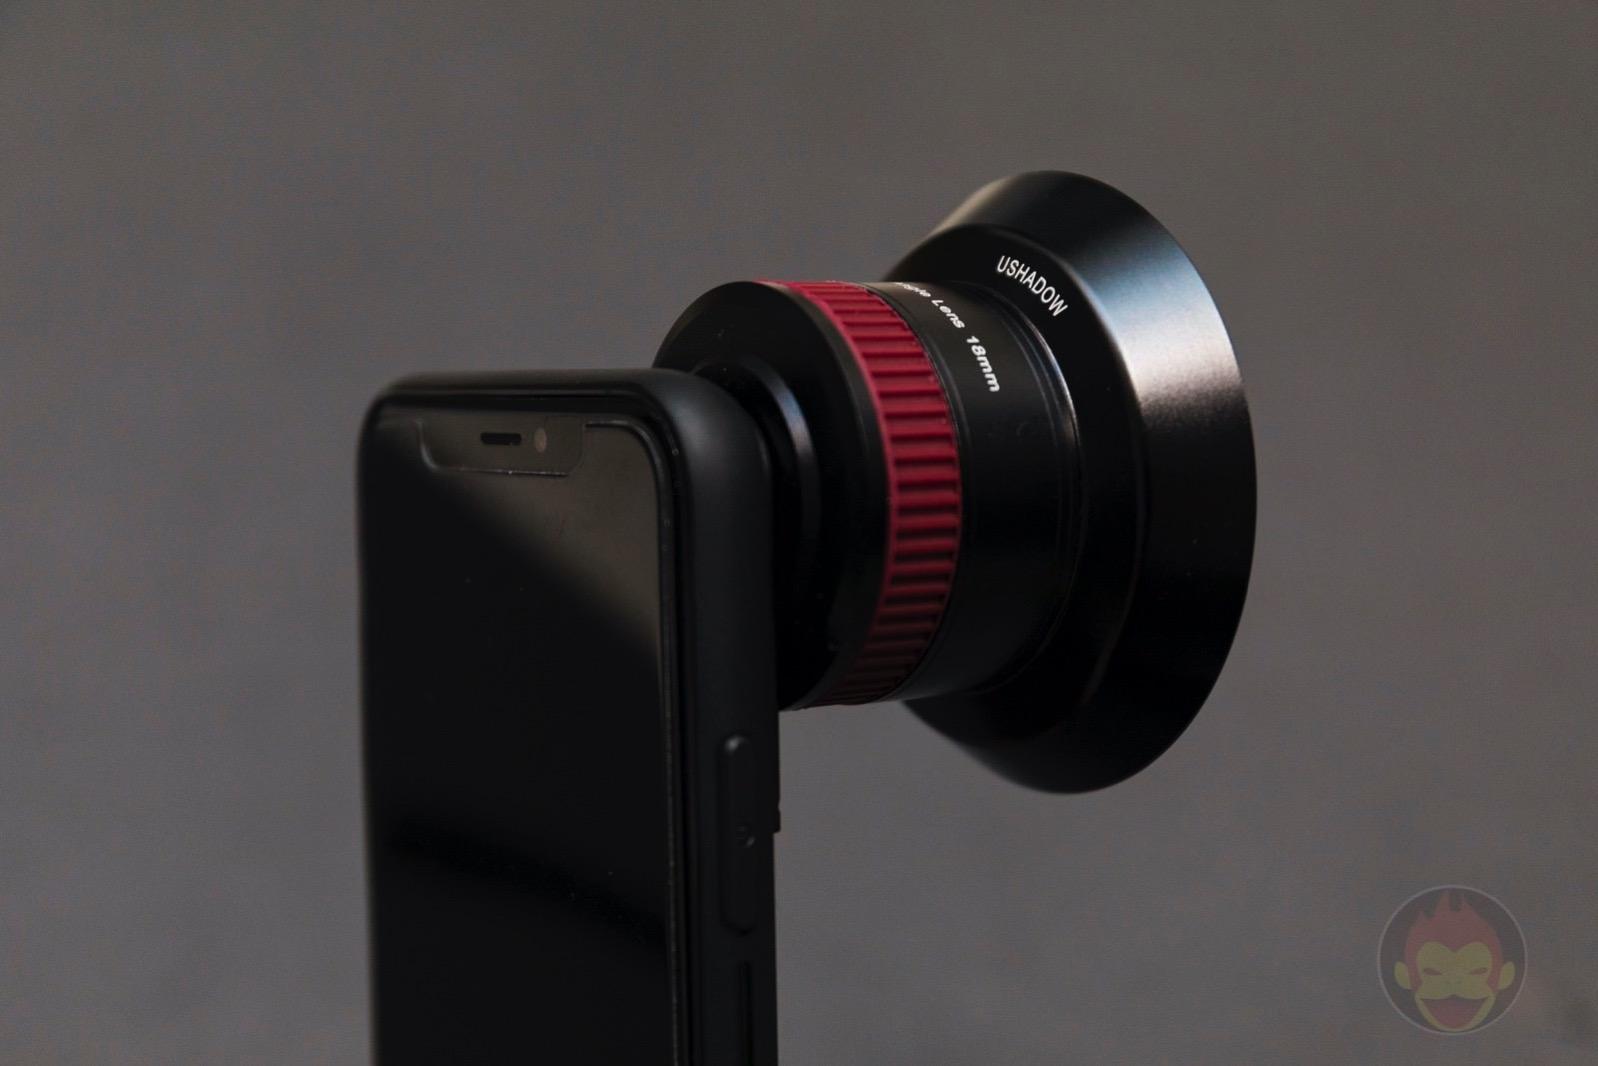 USHADOW-X1-Lens-System-Review-14.jpg